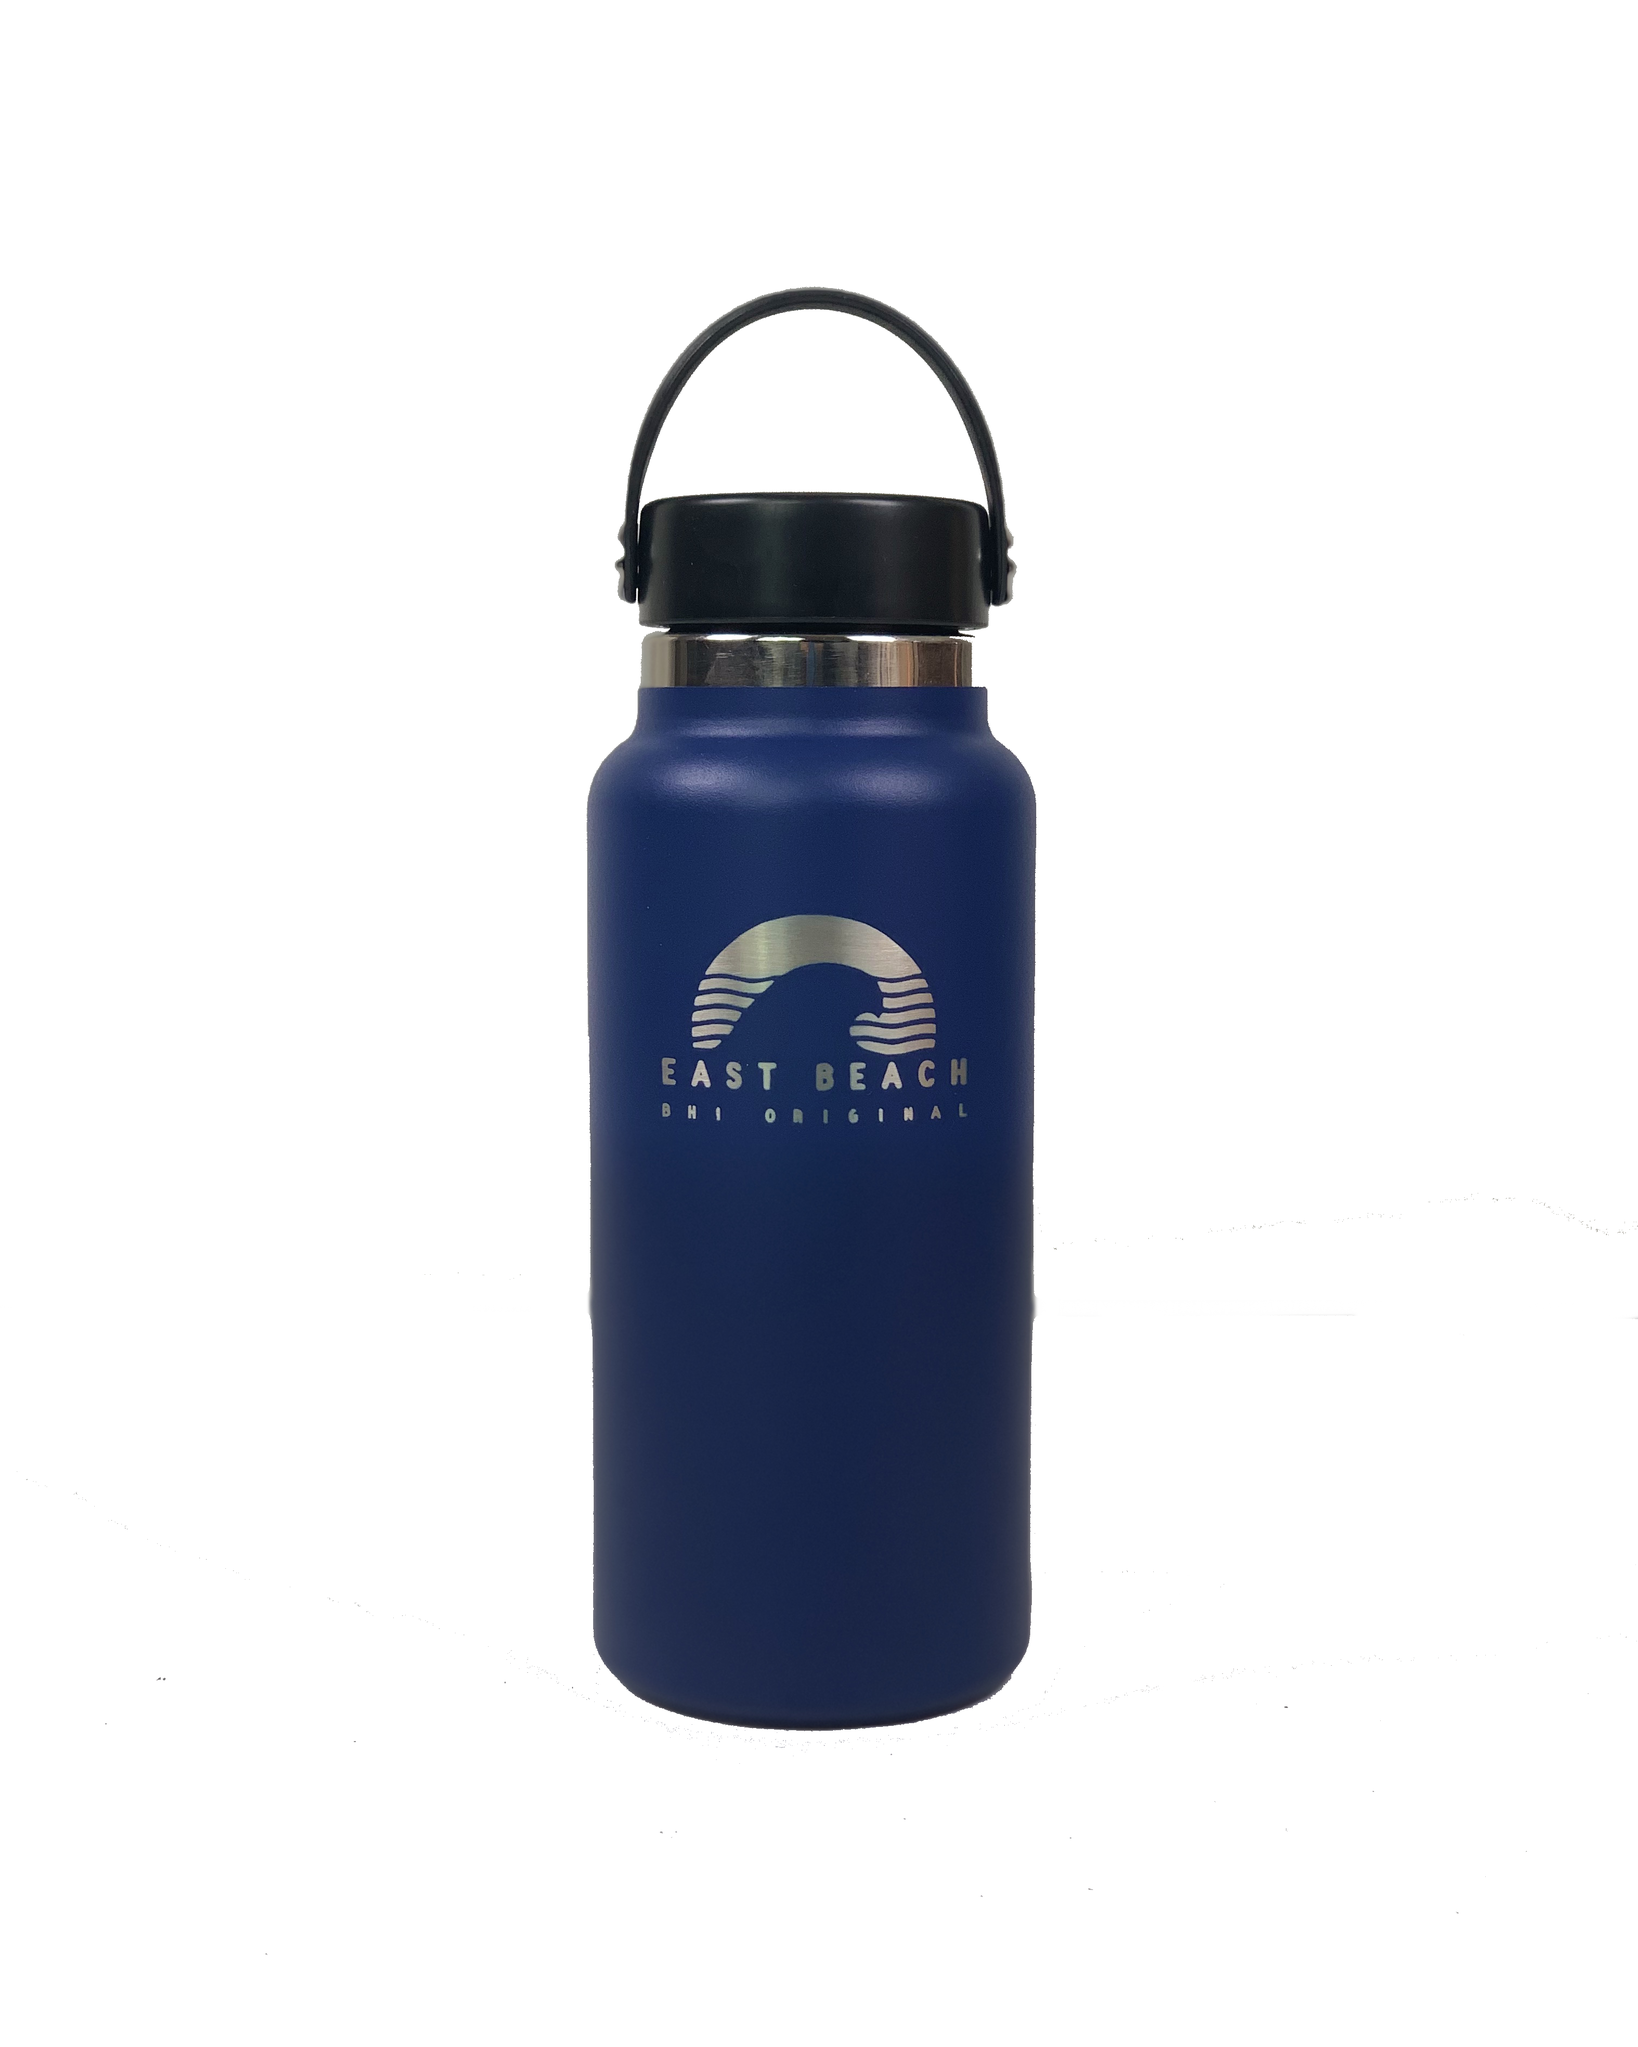 Hydro Flask 32oz East Beach Engraved Flask